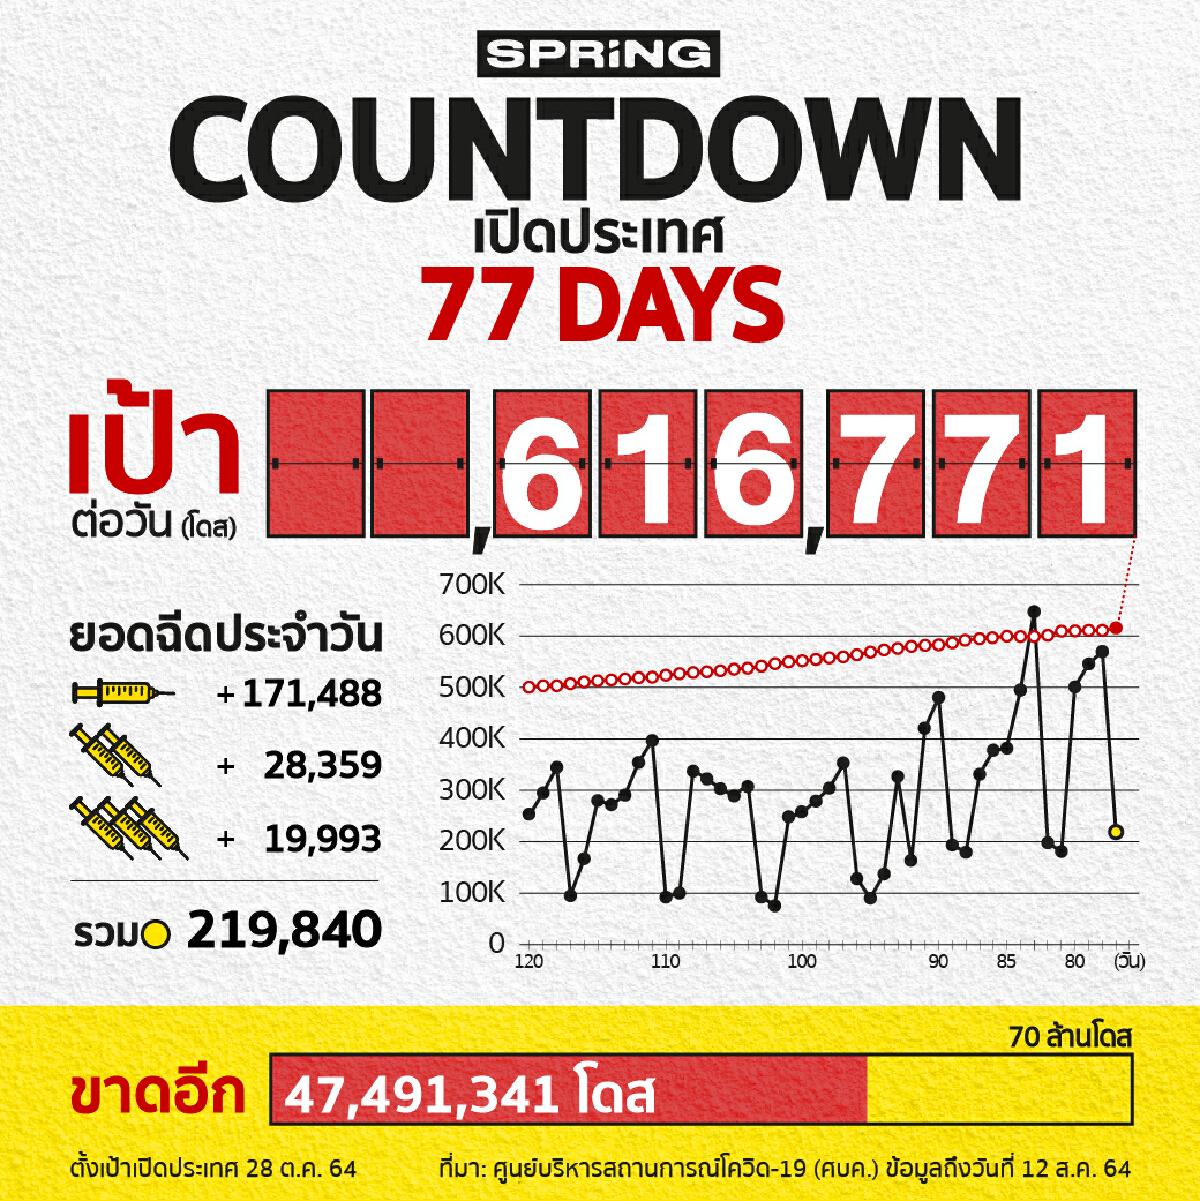 COUNTDOWN! เปิดประเทศใน 77 วัน ฉีดวัคซีนโควิด 219,840 โดส